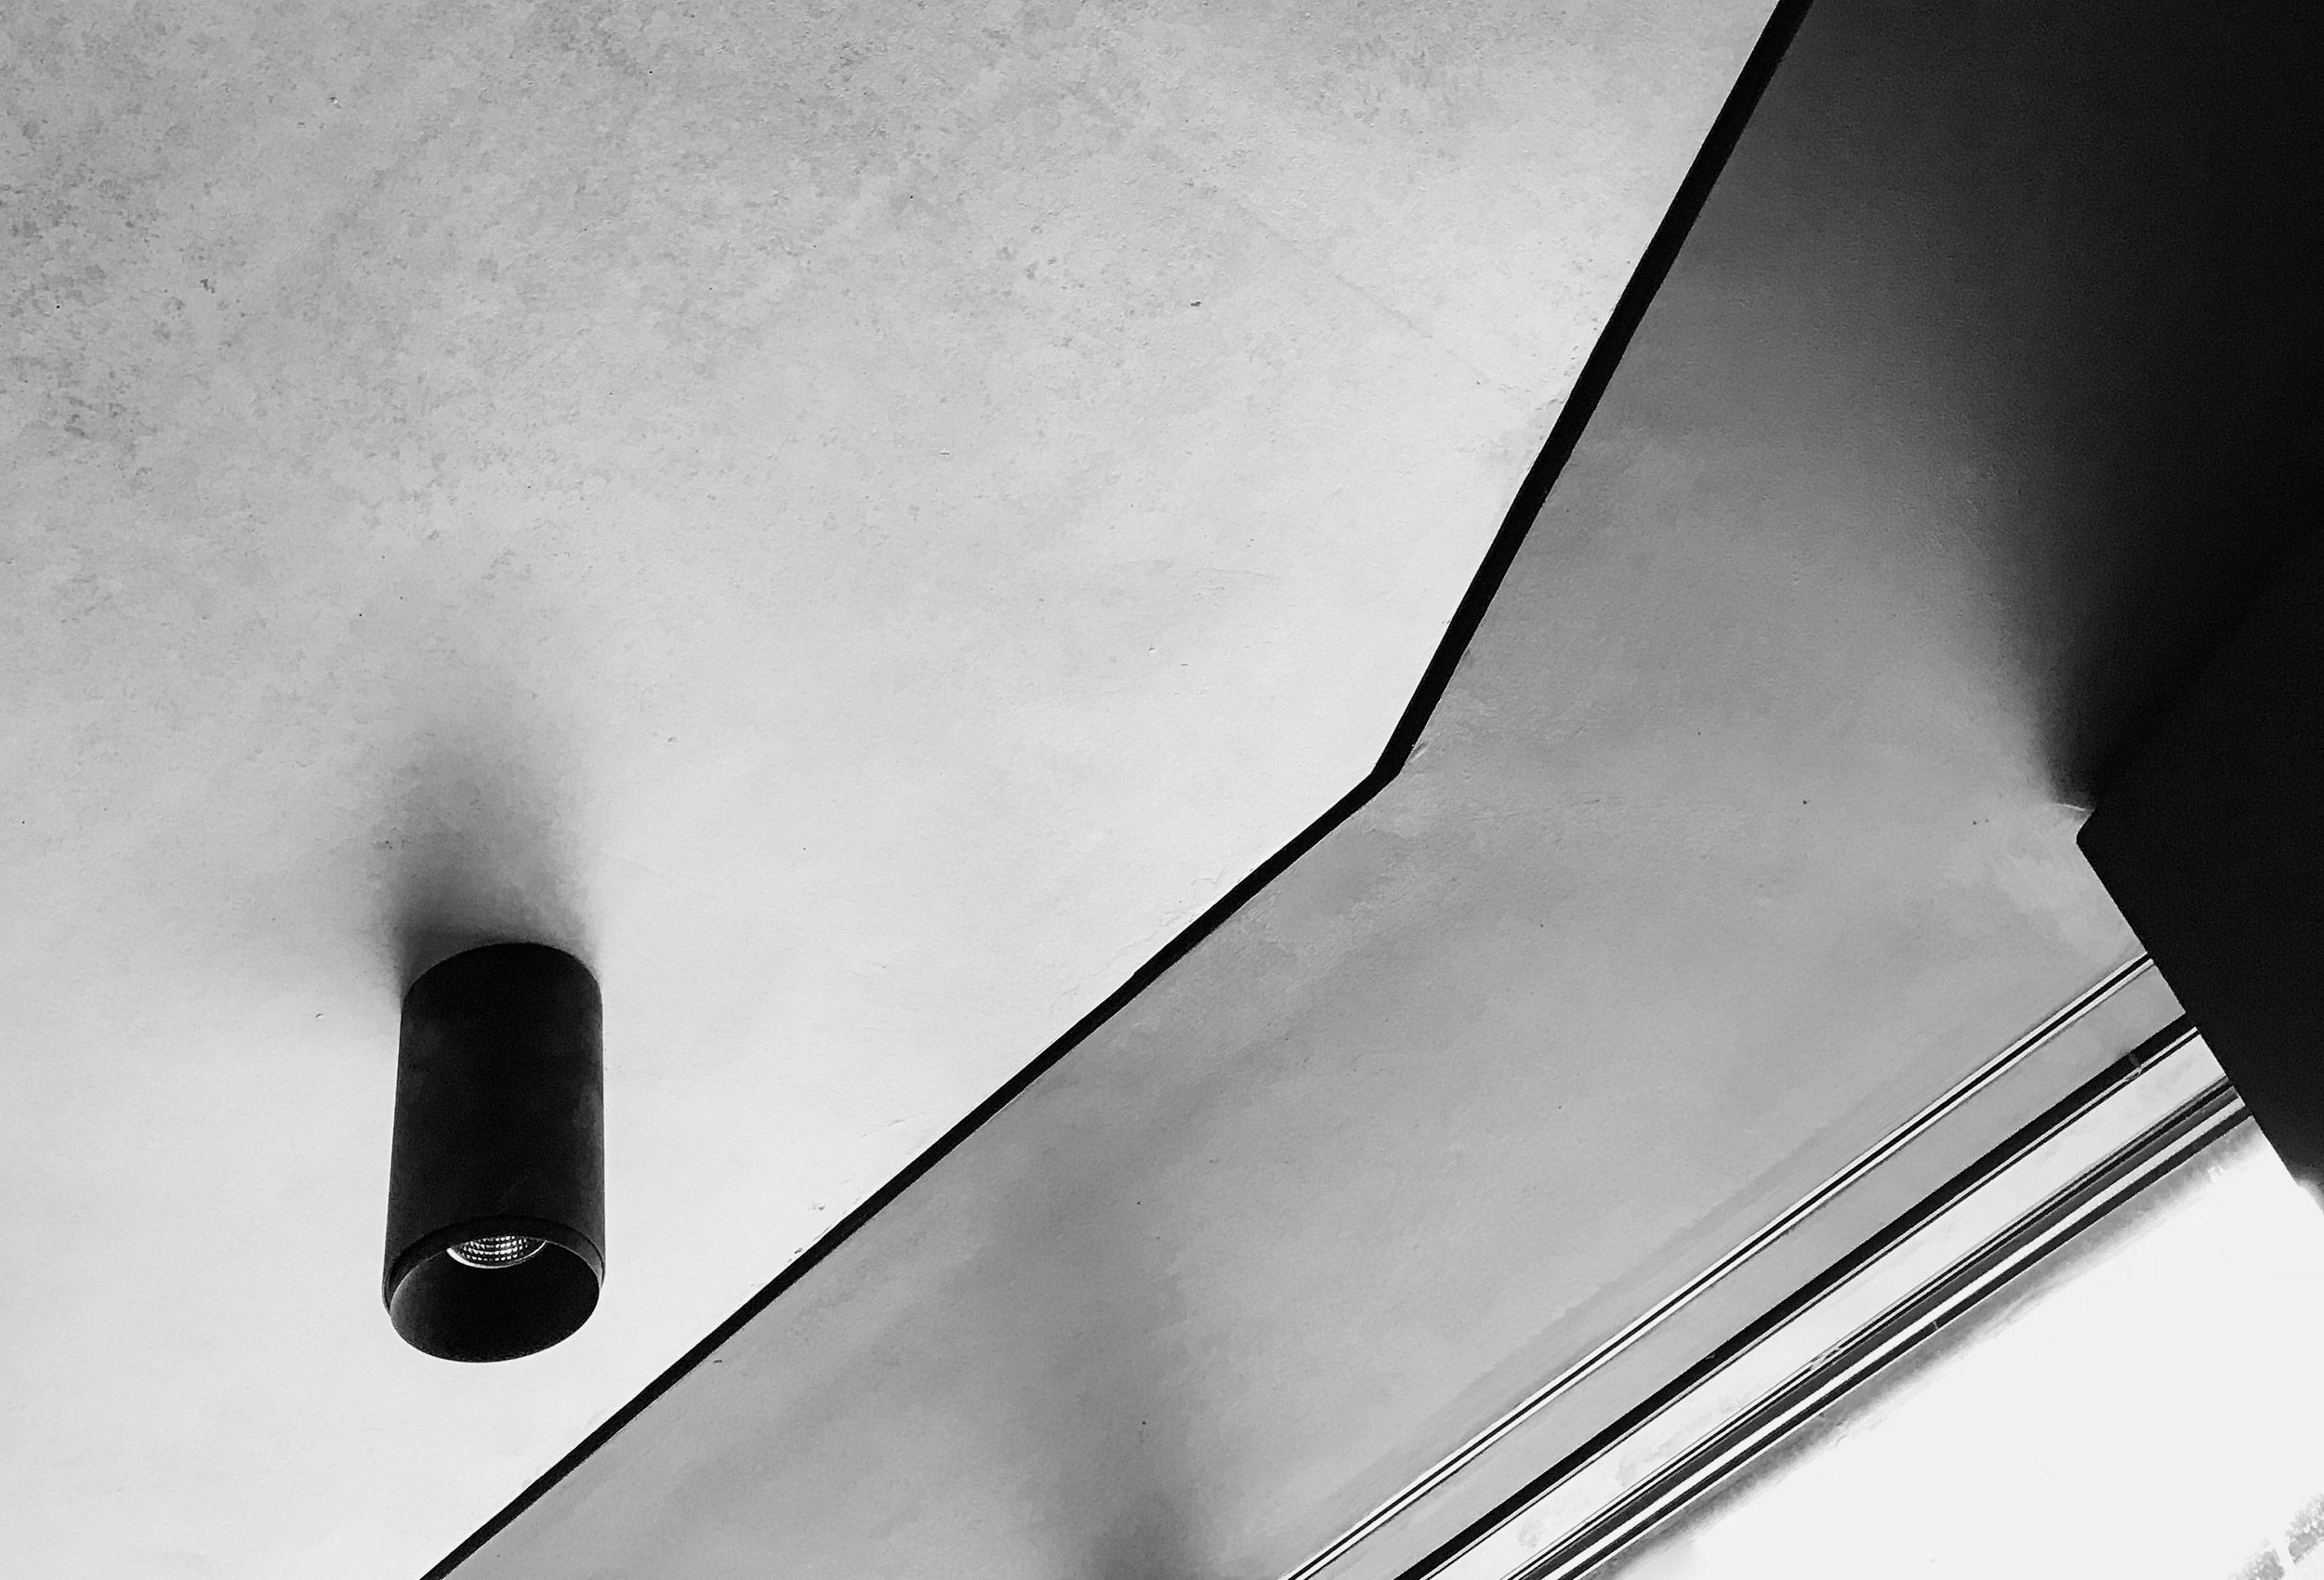 hyde-and-hyde-RHA-edge-house-ceiling-detail.JPG